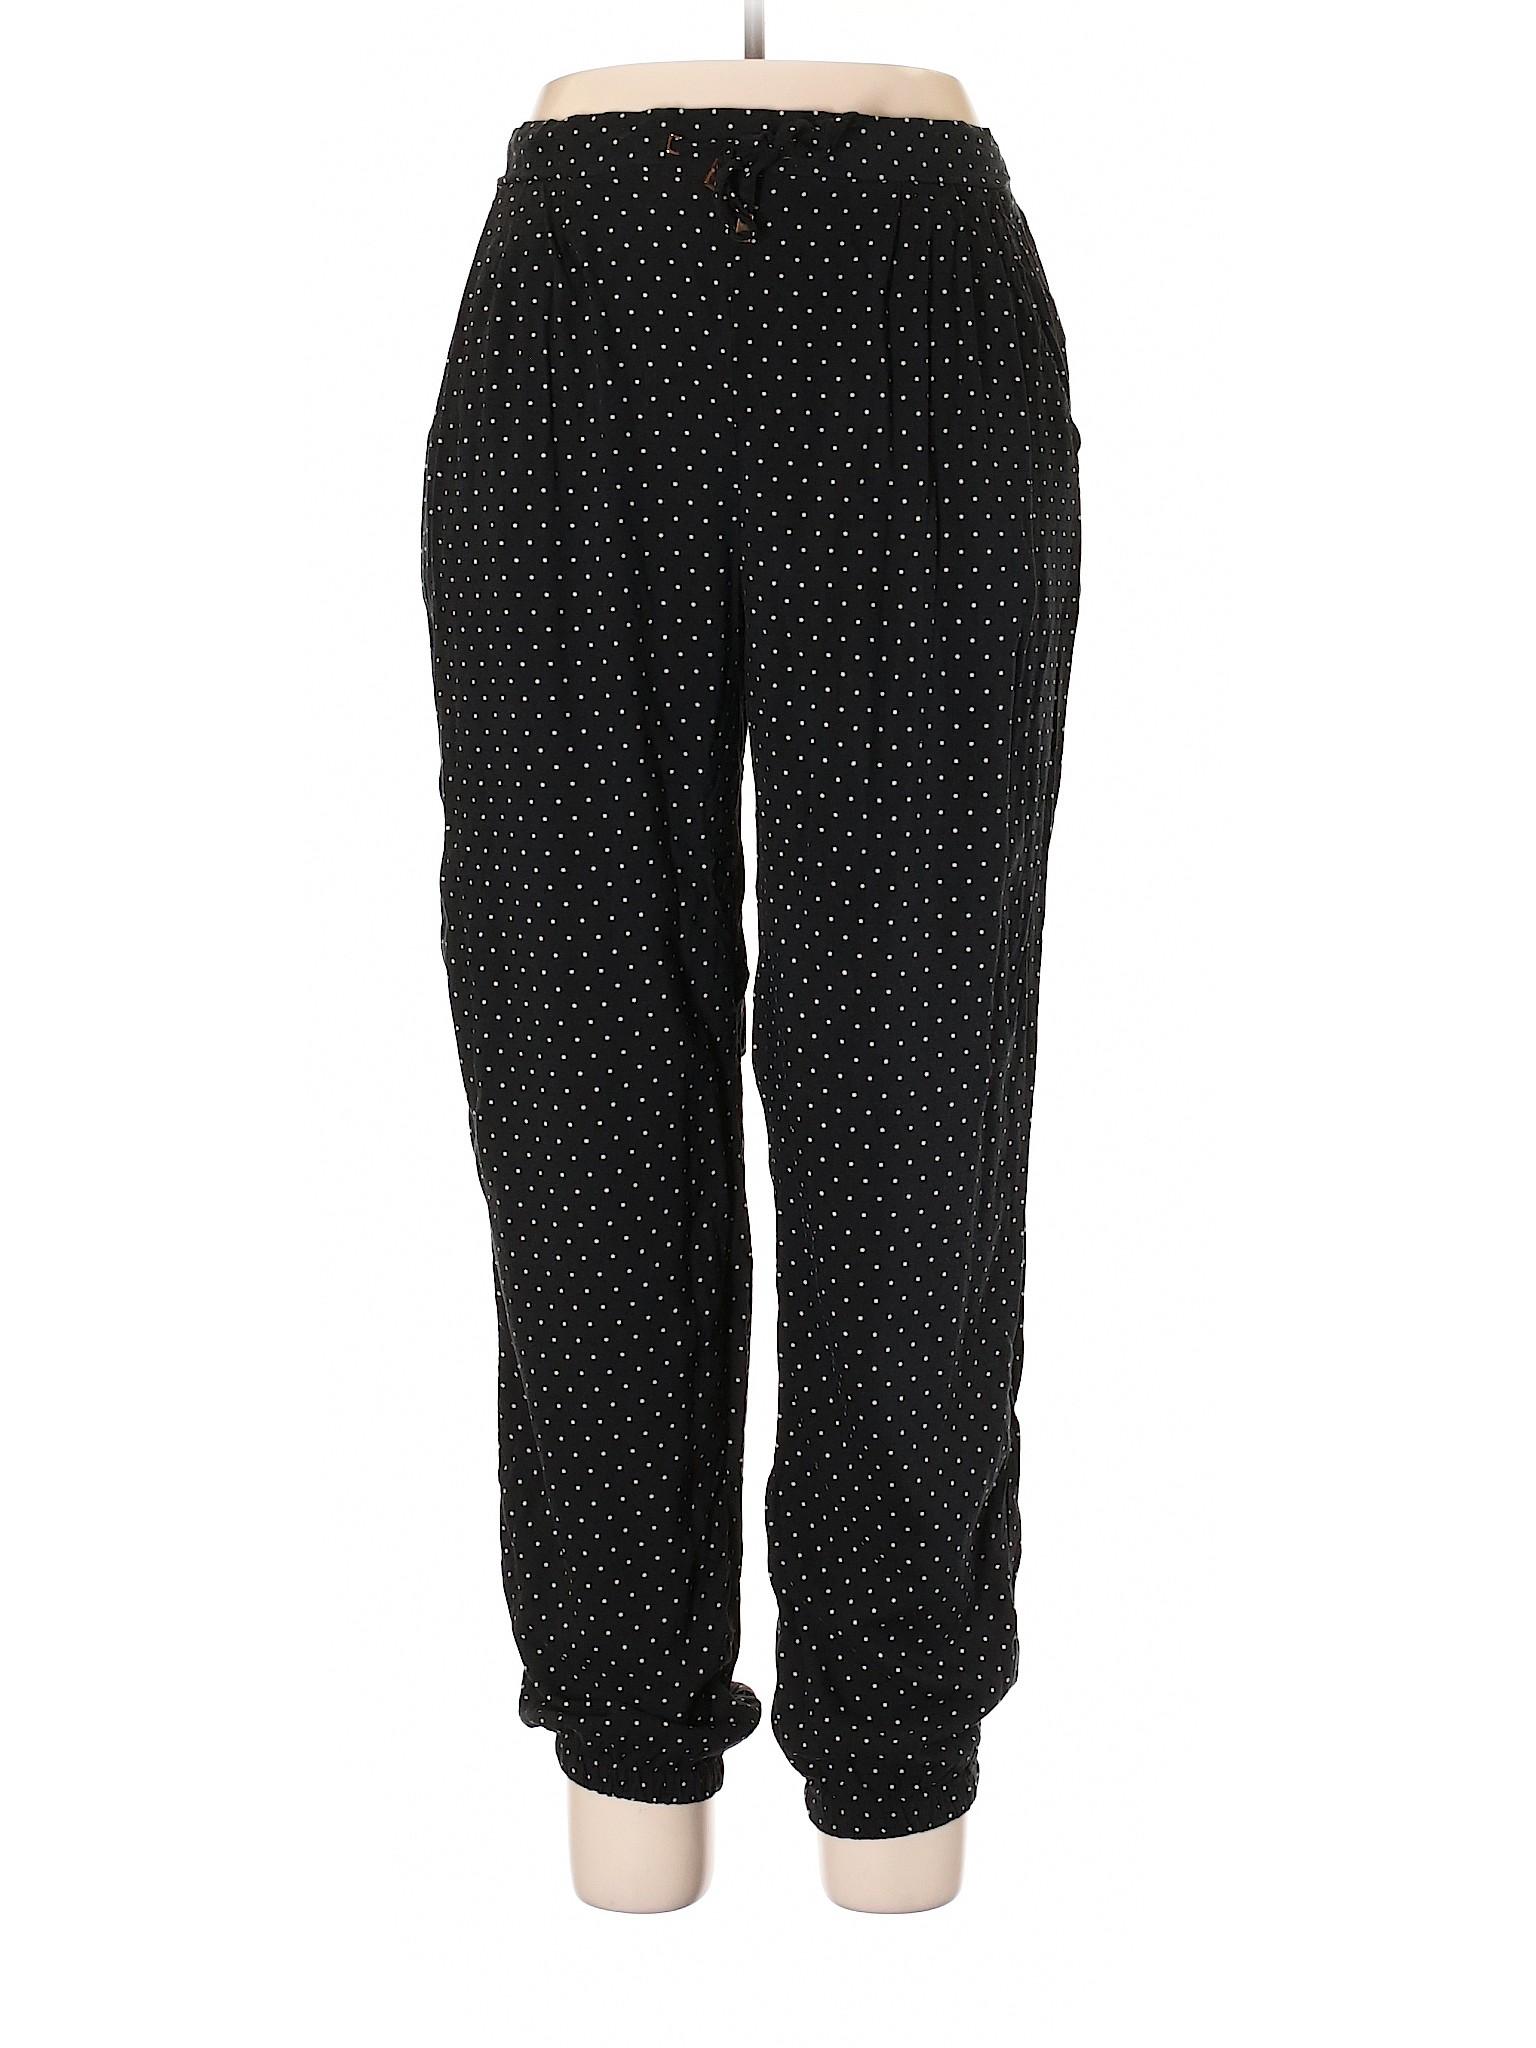 Primark Primark winter winter Boutique Casual Boutique Casual Primark Primark Pants winter Pants Casual Boutique Boutique Pants winter Cdxx5qw